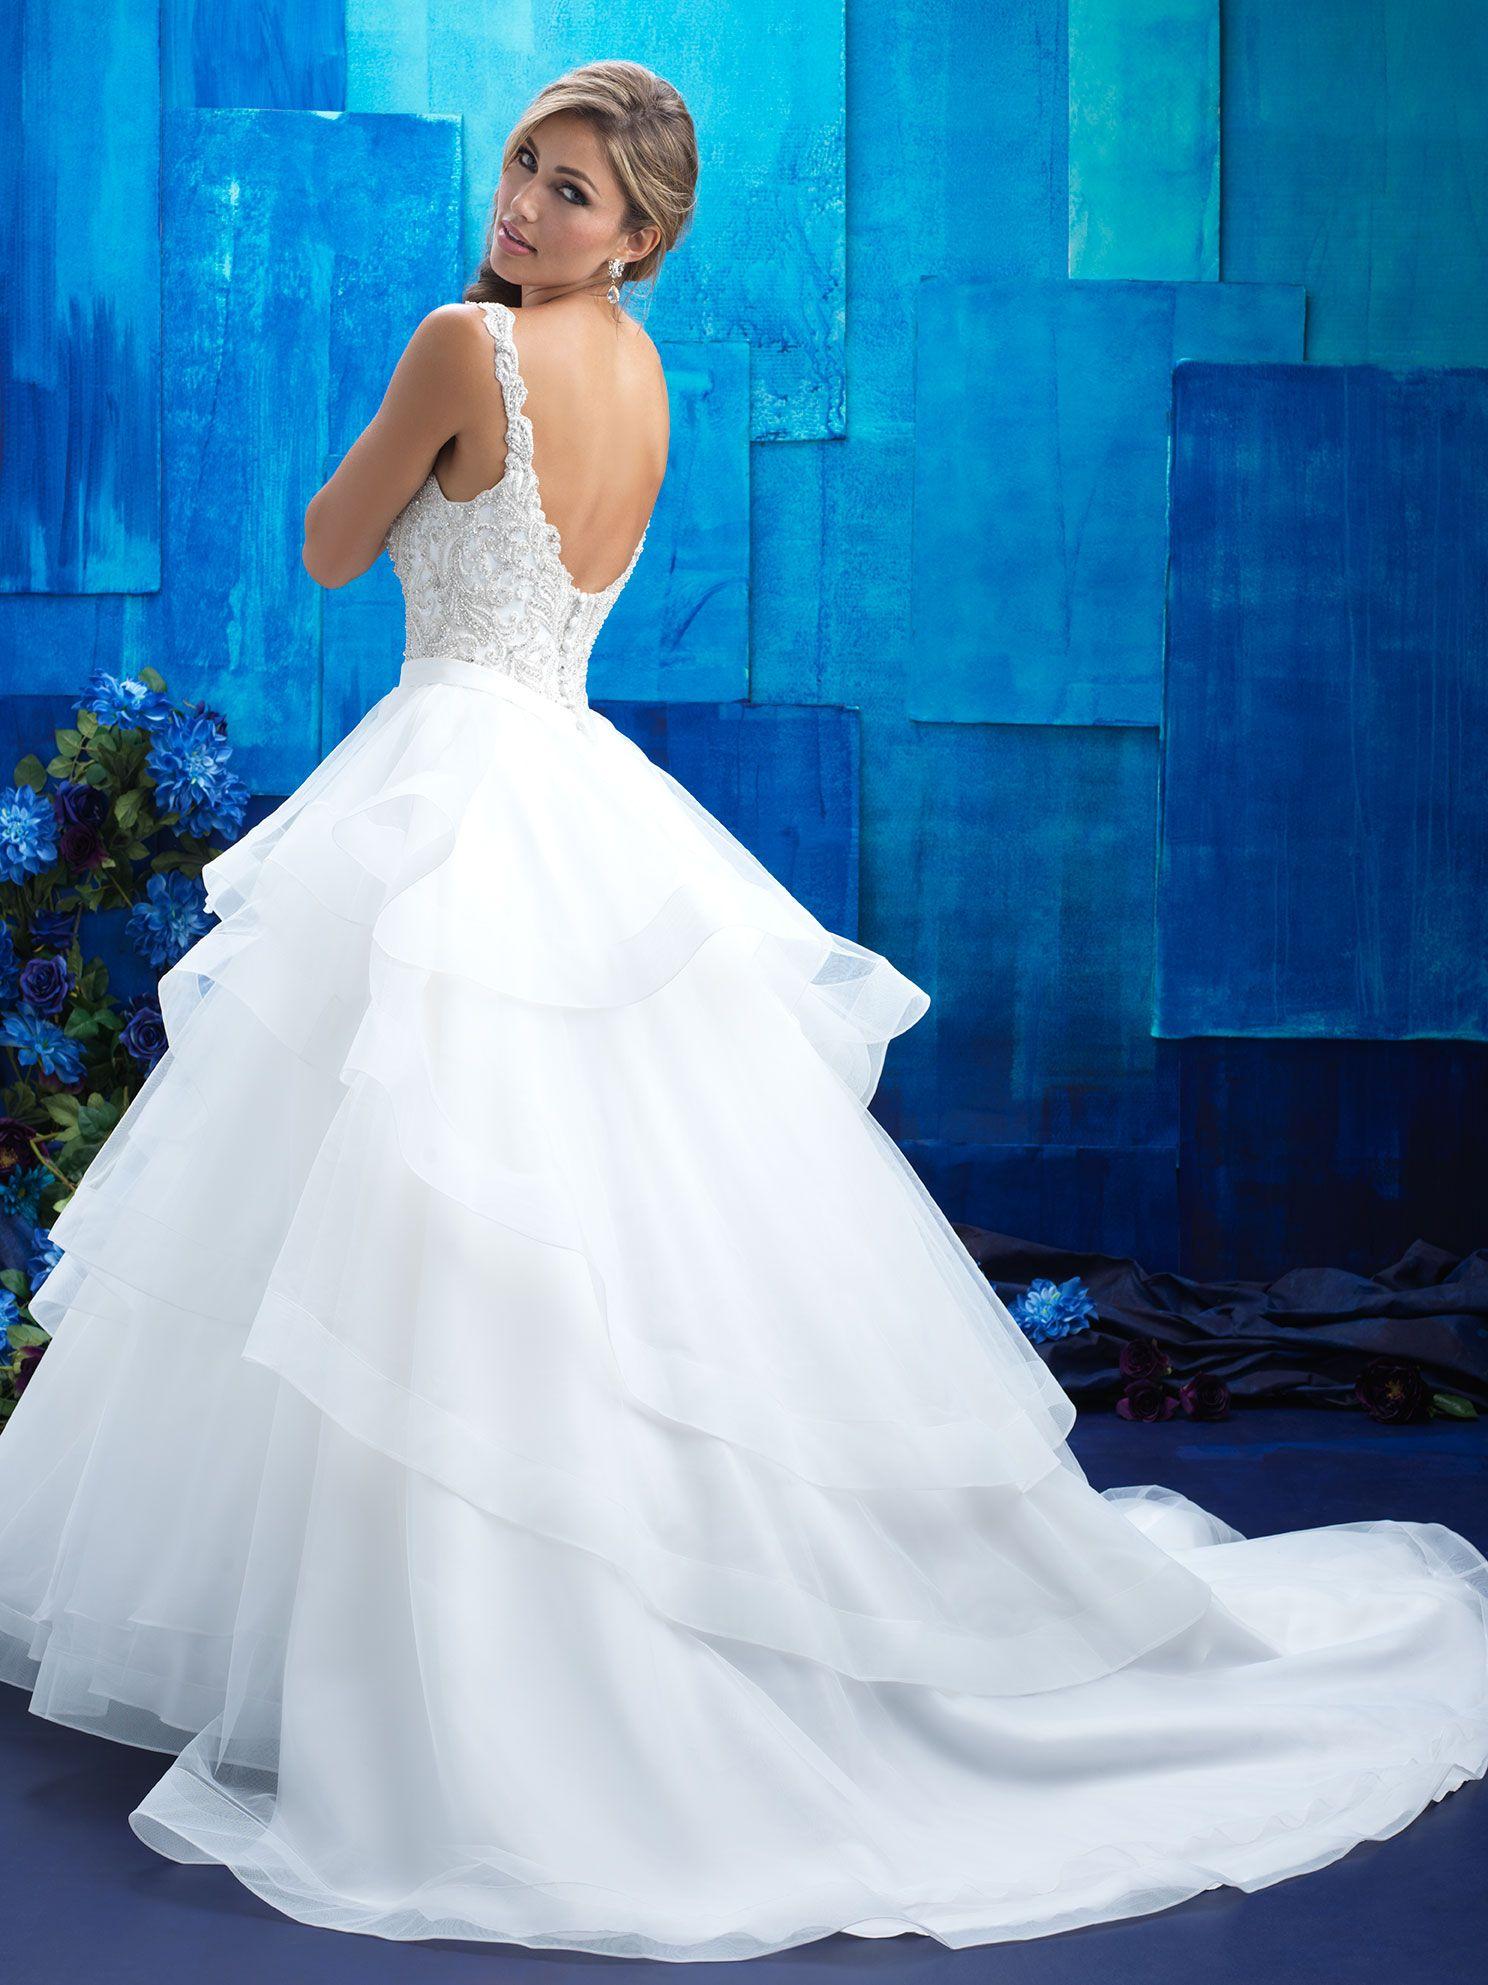 AllureBridals.com Structured layered ruffles full tulle skirt.beaded ...